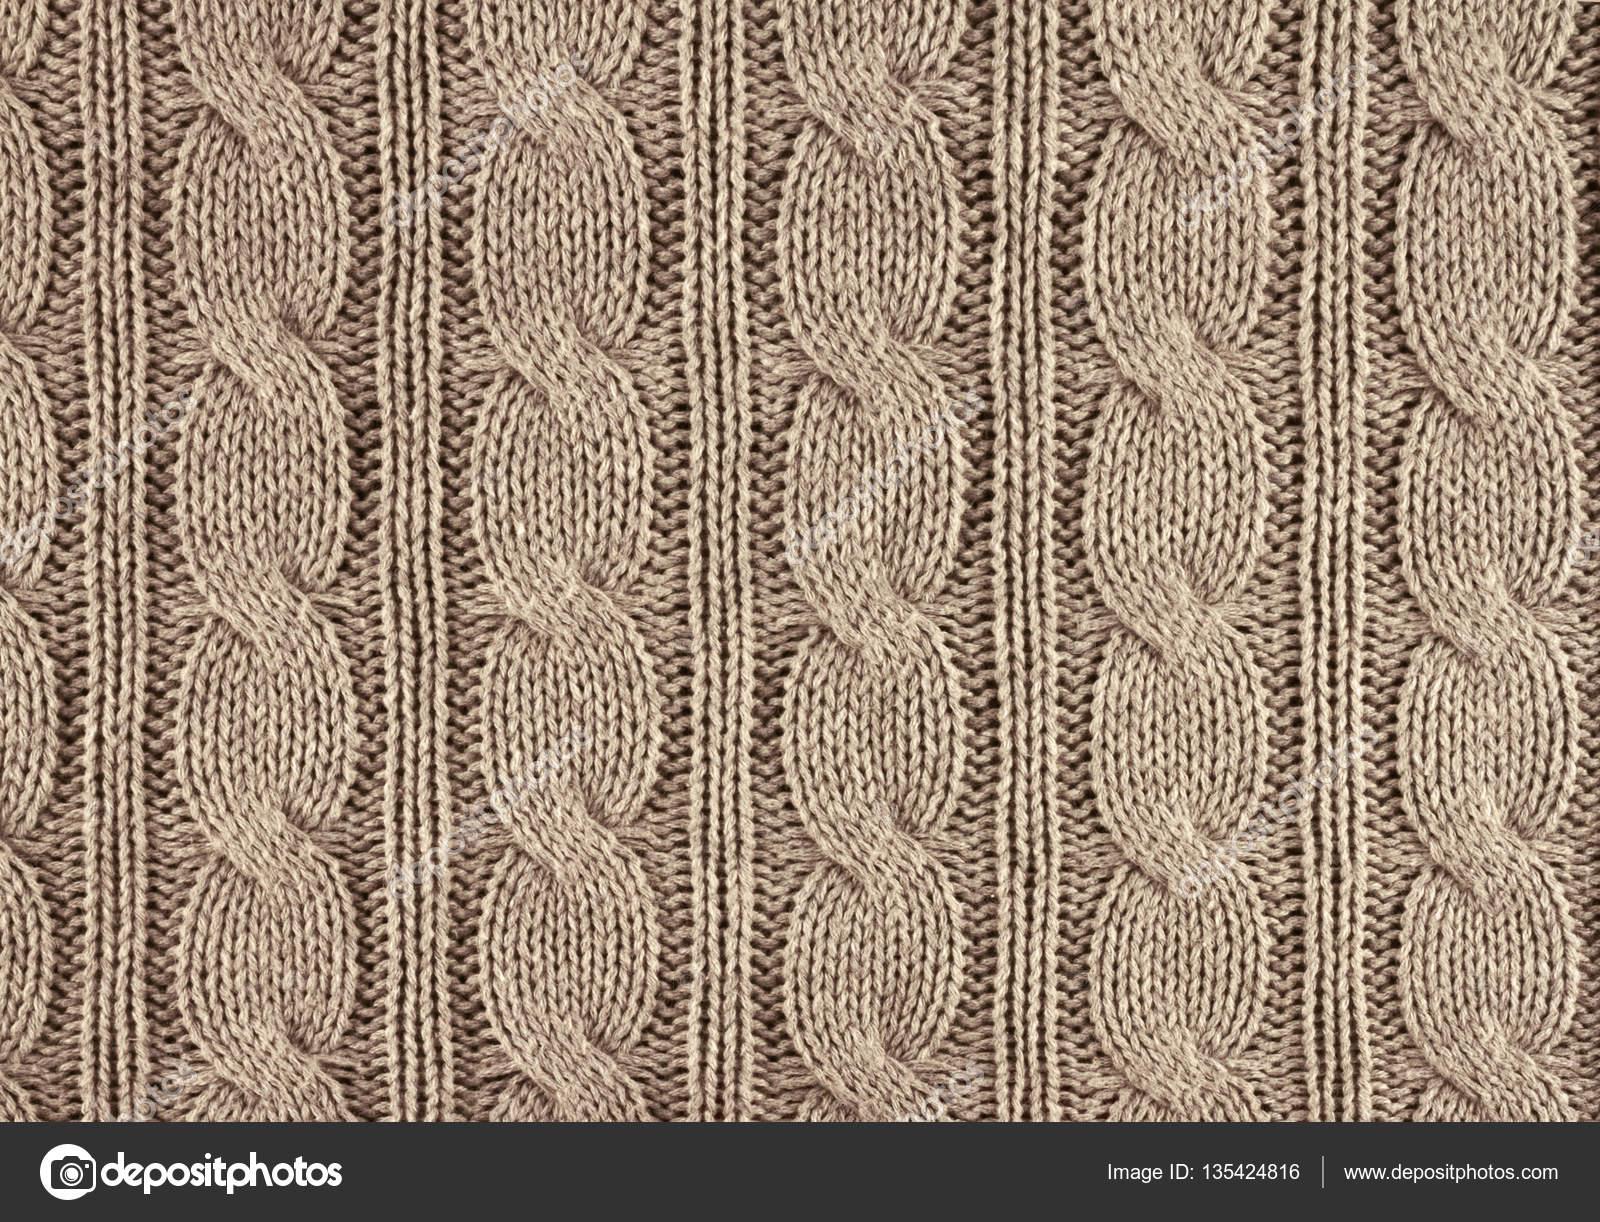 308029378d10 Μπεζ πλεκτή υφή φόντου με ένα closeup μοτίβο — Εικόνα από rustamank. Βρείτε  παρόμοιες εικόνες